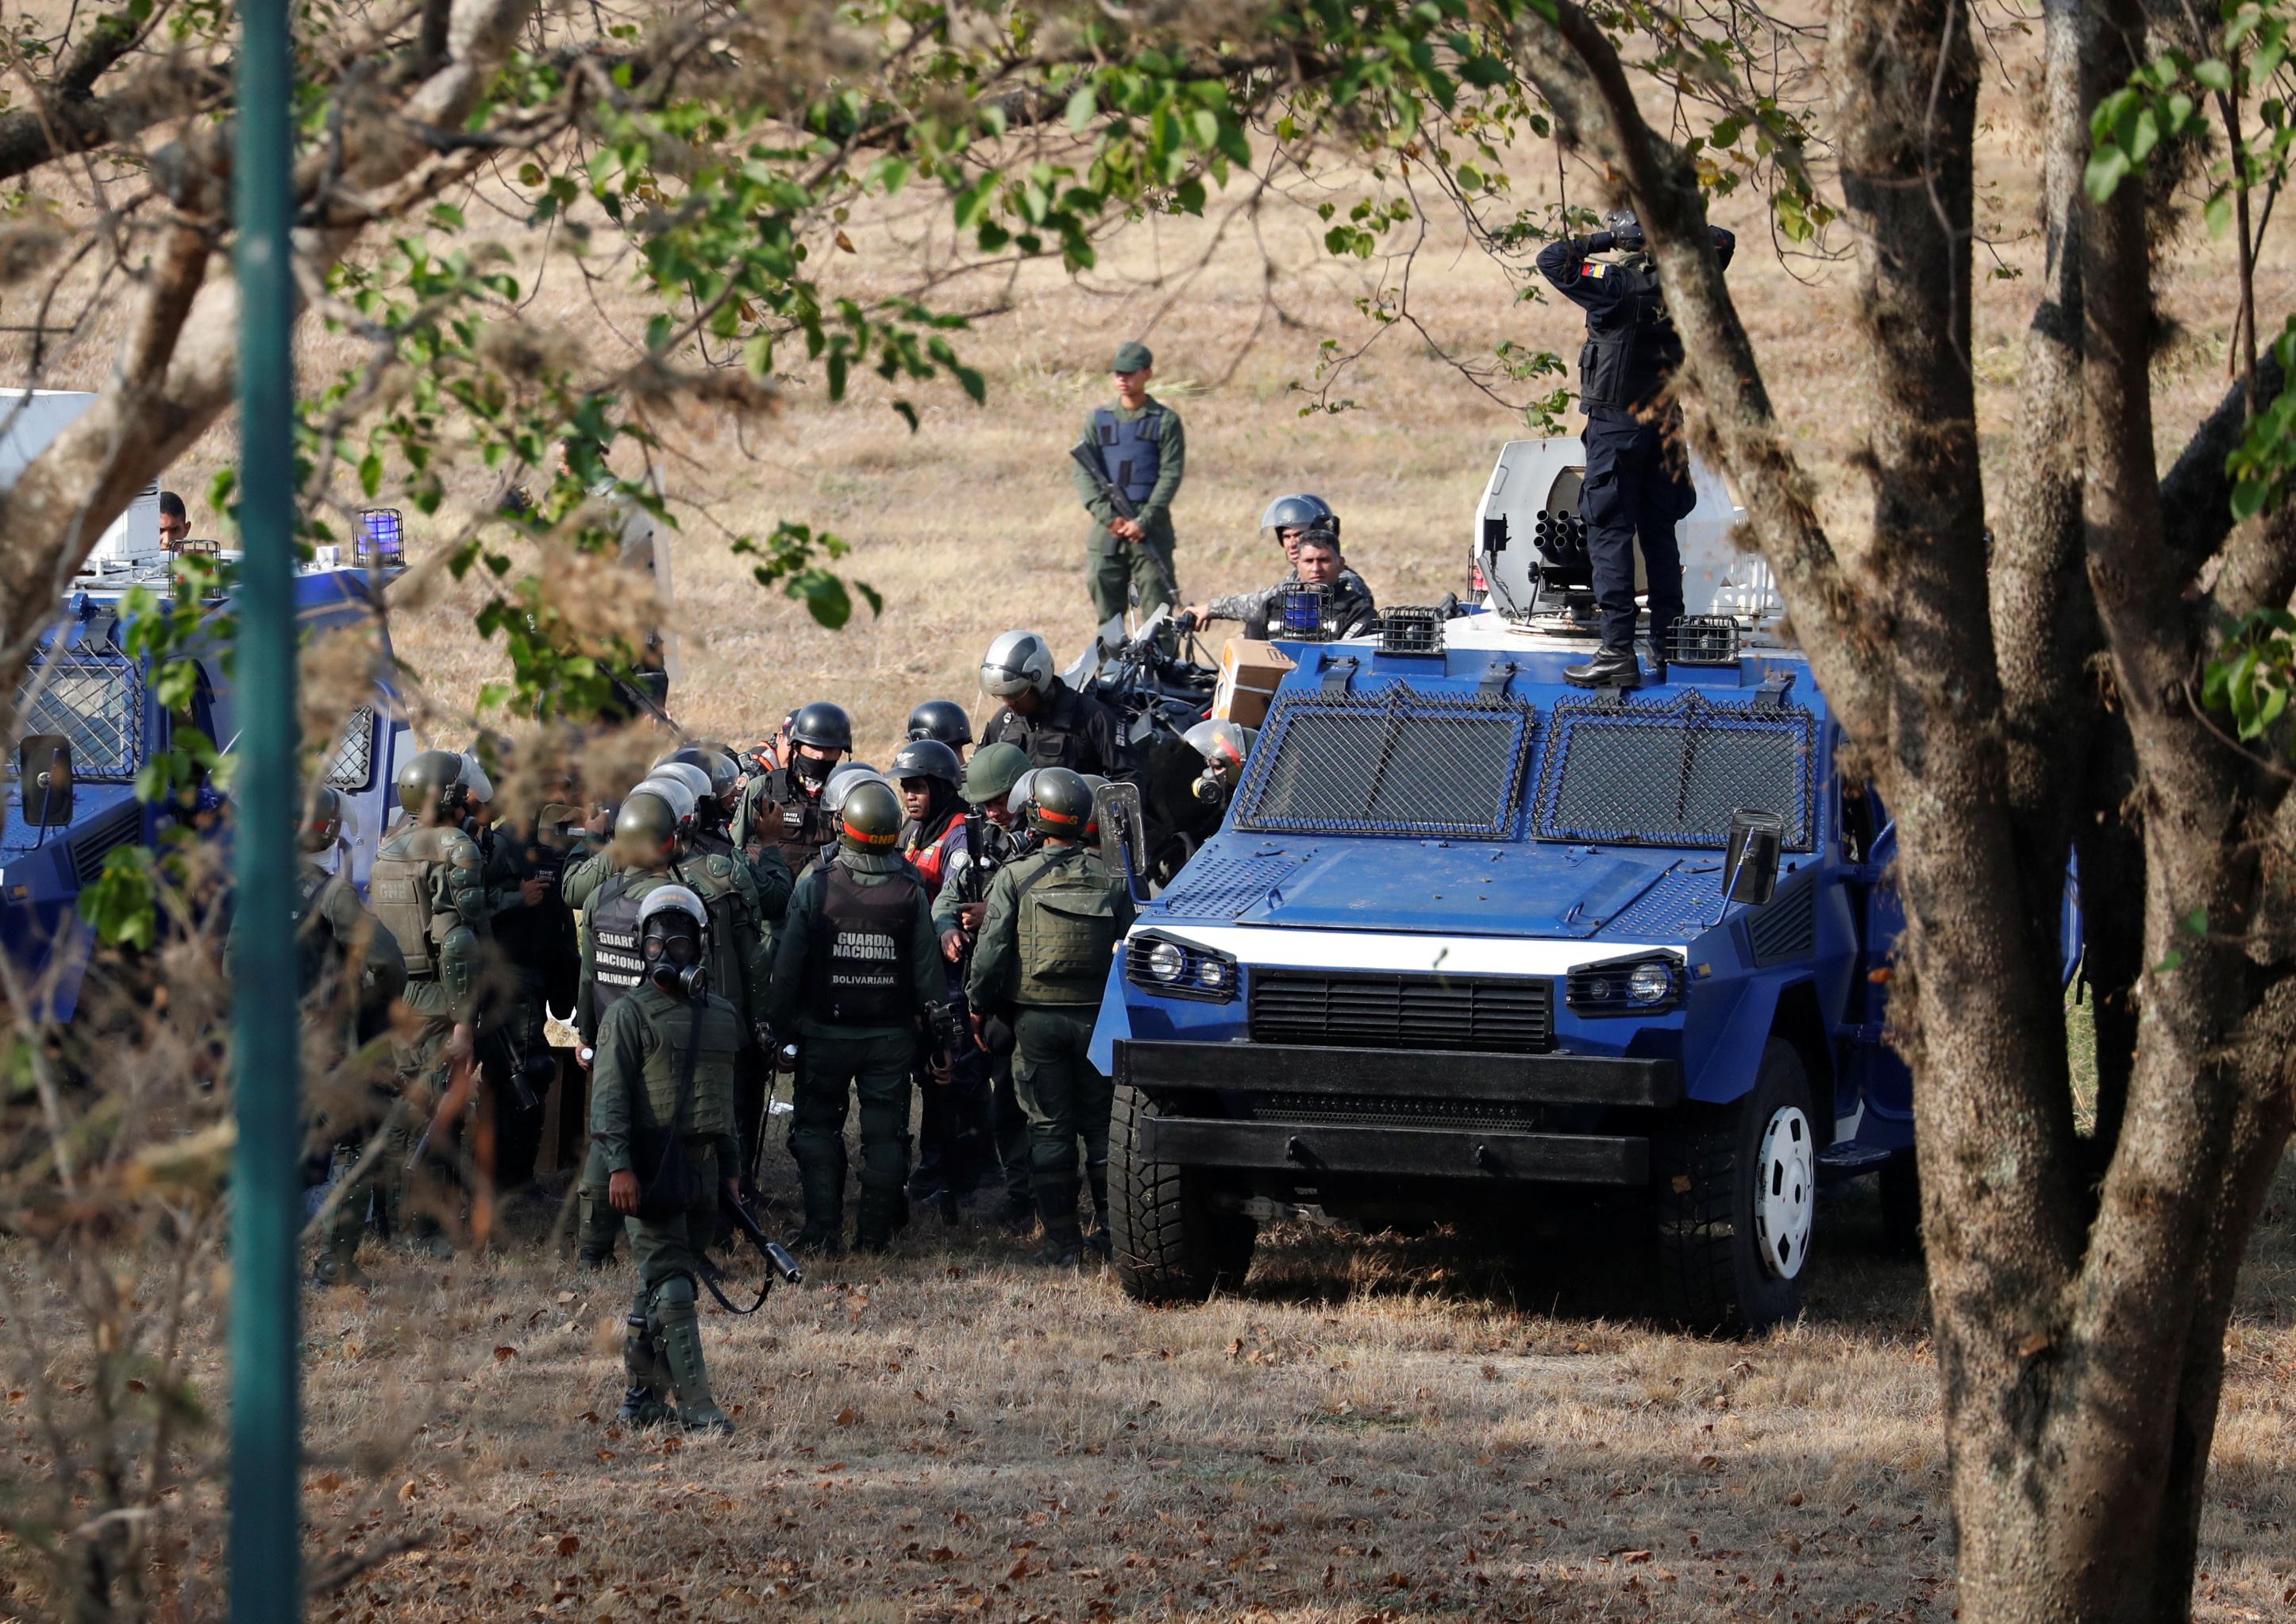 2019-04-30T143455Z_1042219197_RC19AF42DC20_RTRMADP_3_VENEZUELA-POLITICS